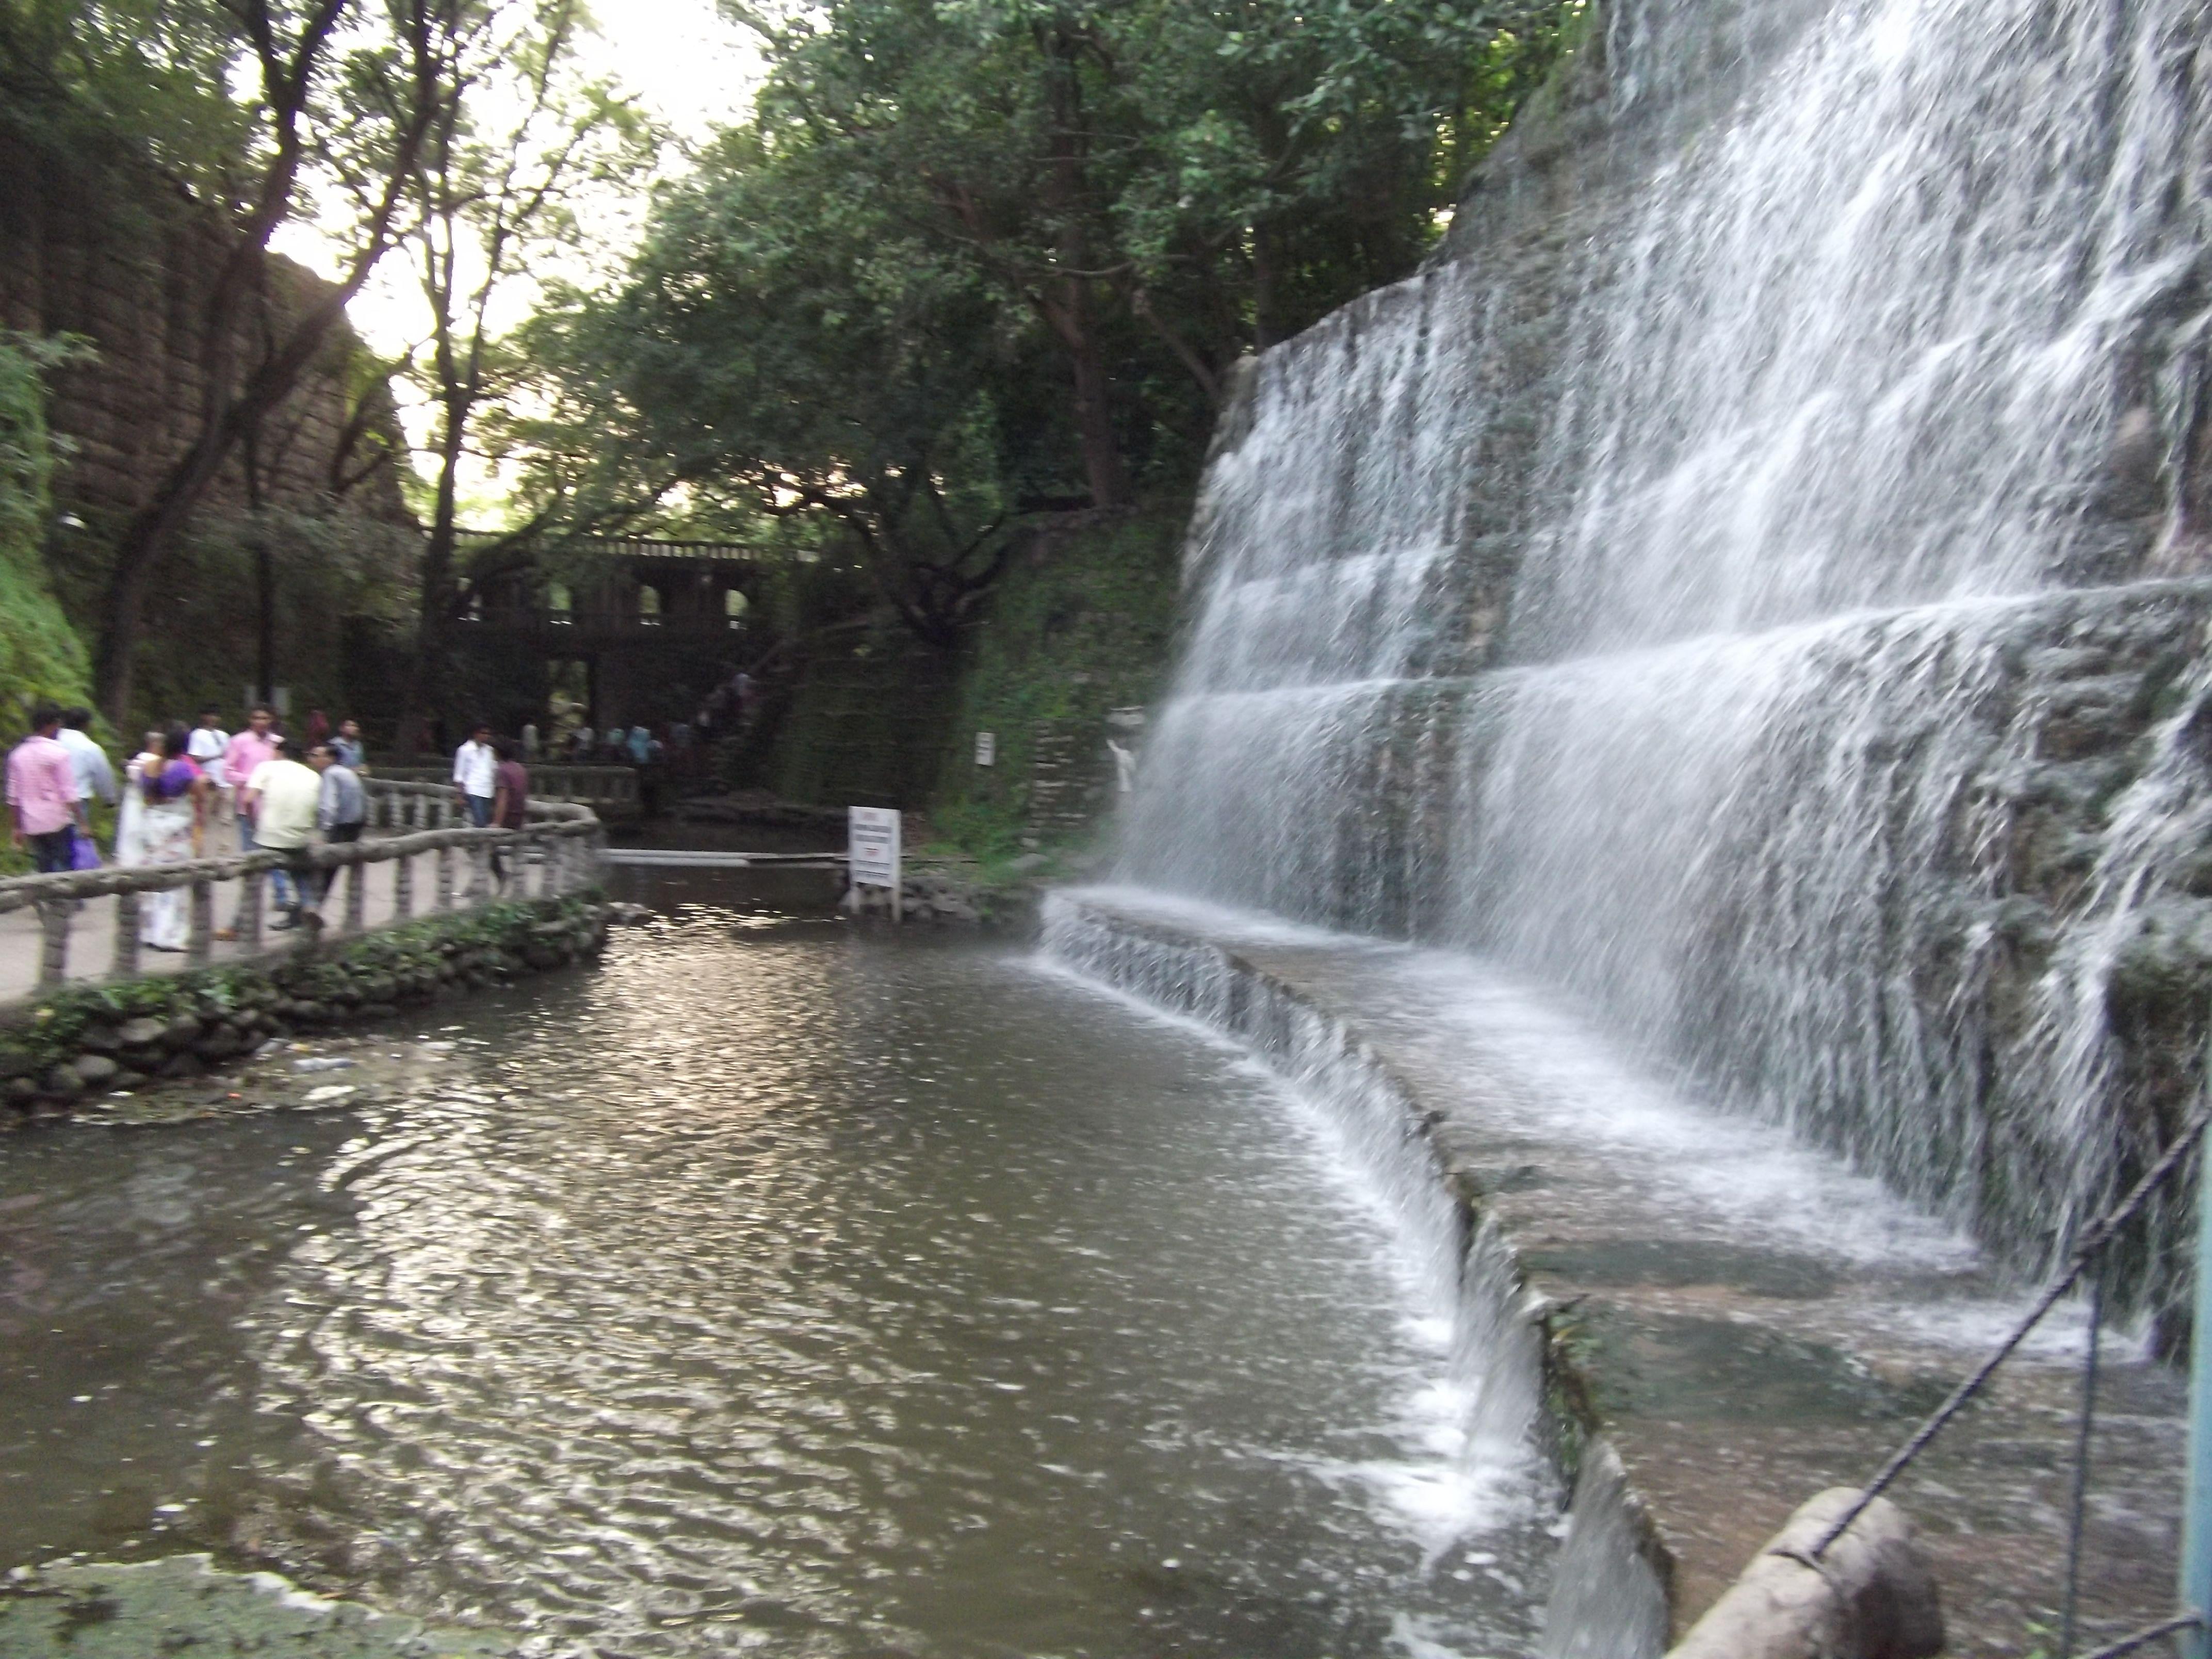 Man Made Waterfall In Rock Garden Chandigarh